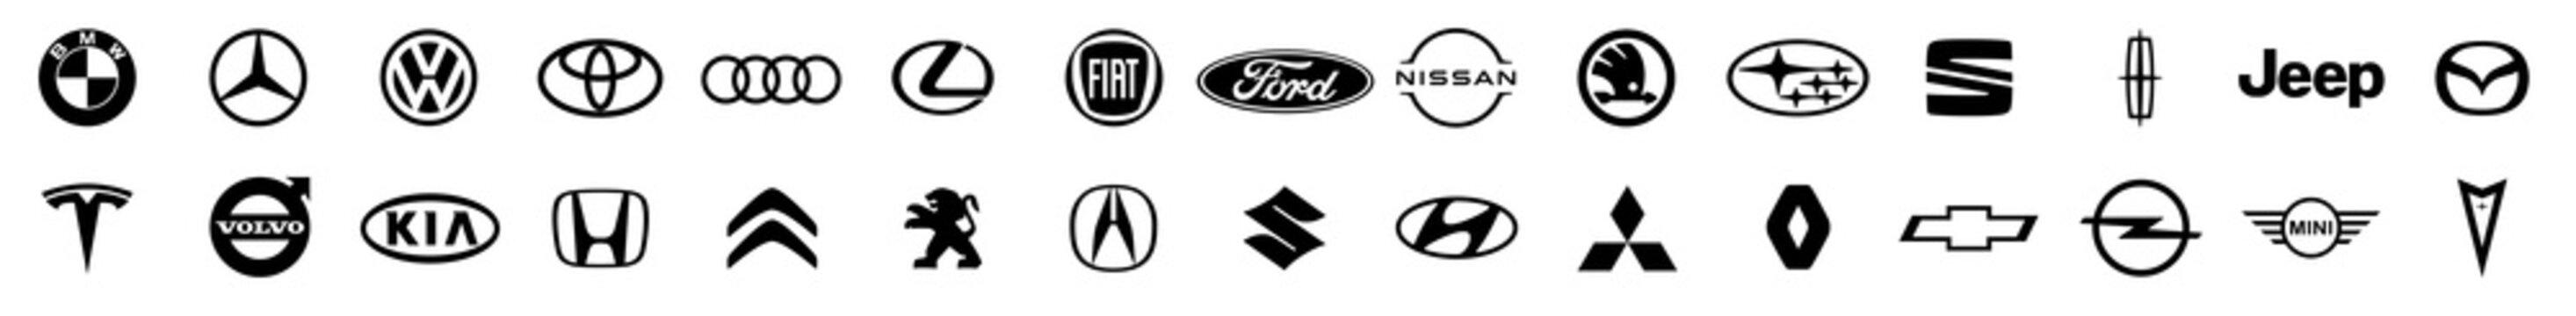 Logo of cars brand set. Black logo of popular brands of cars on a white background. Automotive industry leaders. Volkswagen, bmw, mercedes, toyota, lexus, audi, honda, ford, chevrolet, mazda. Vector